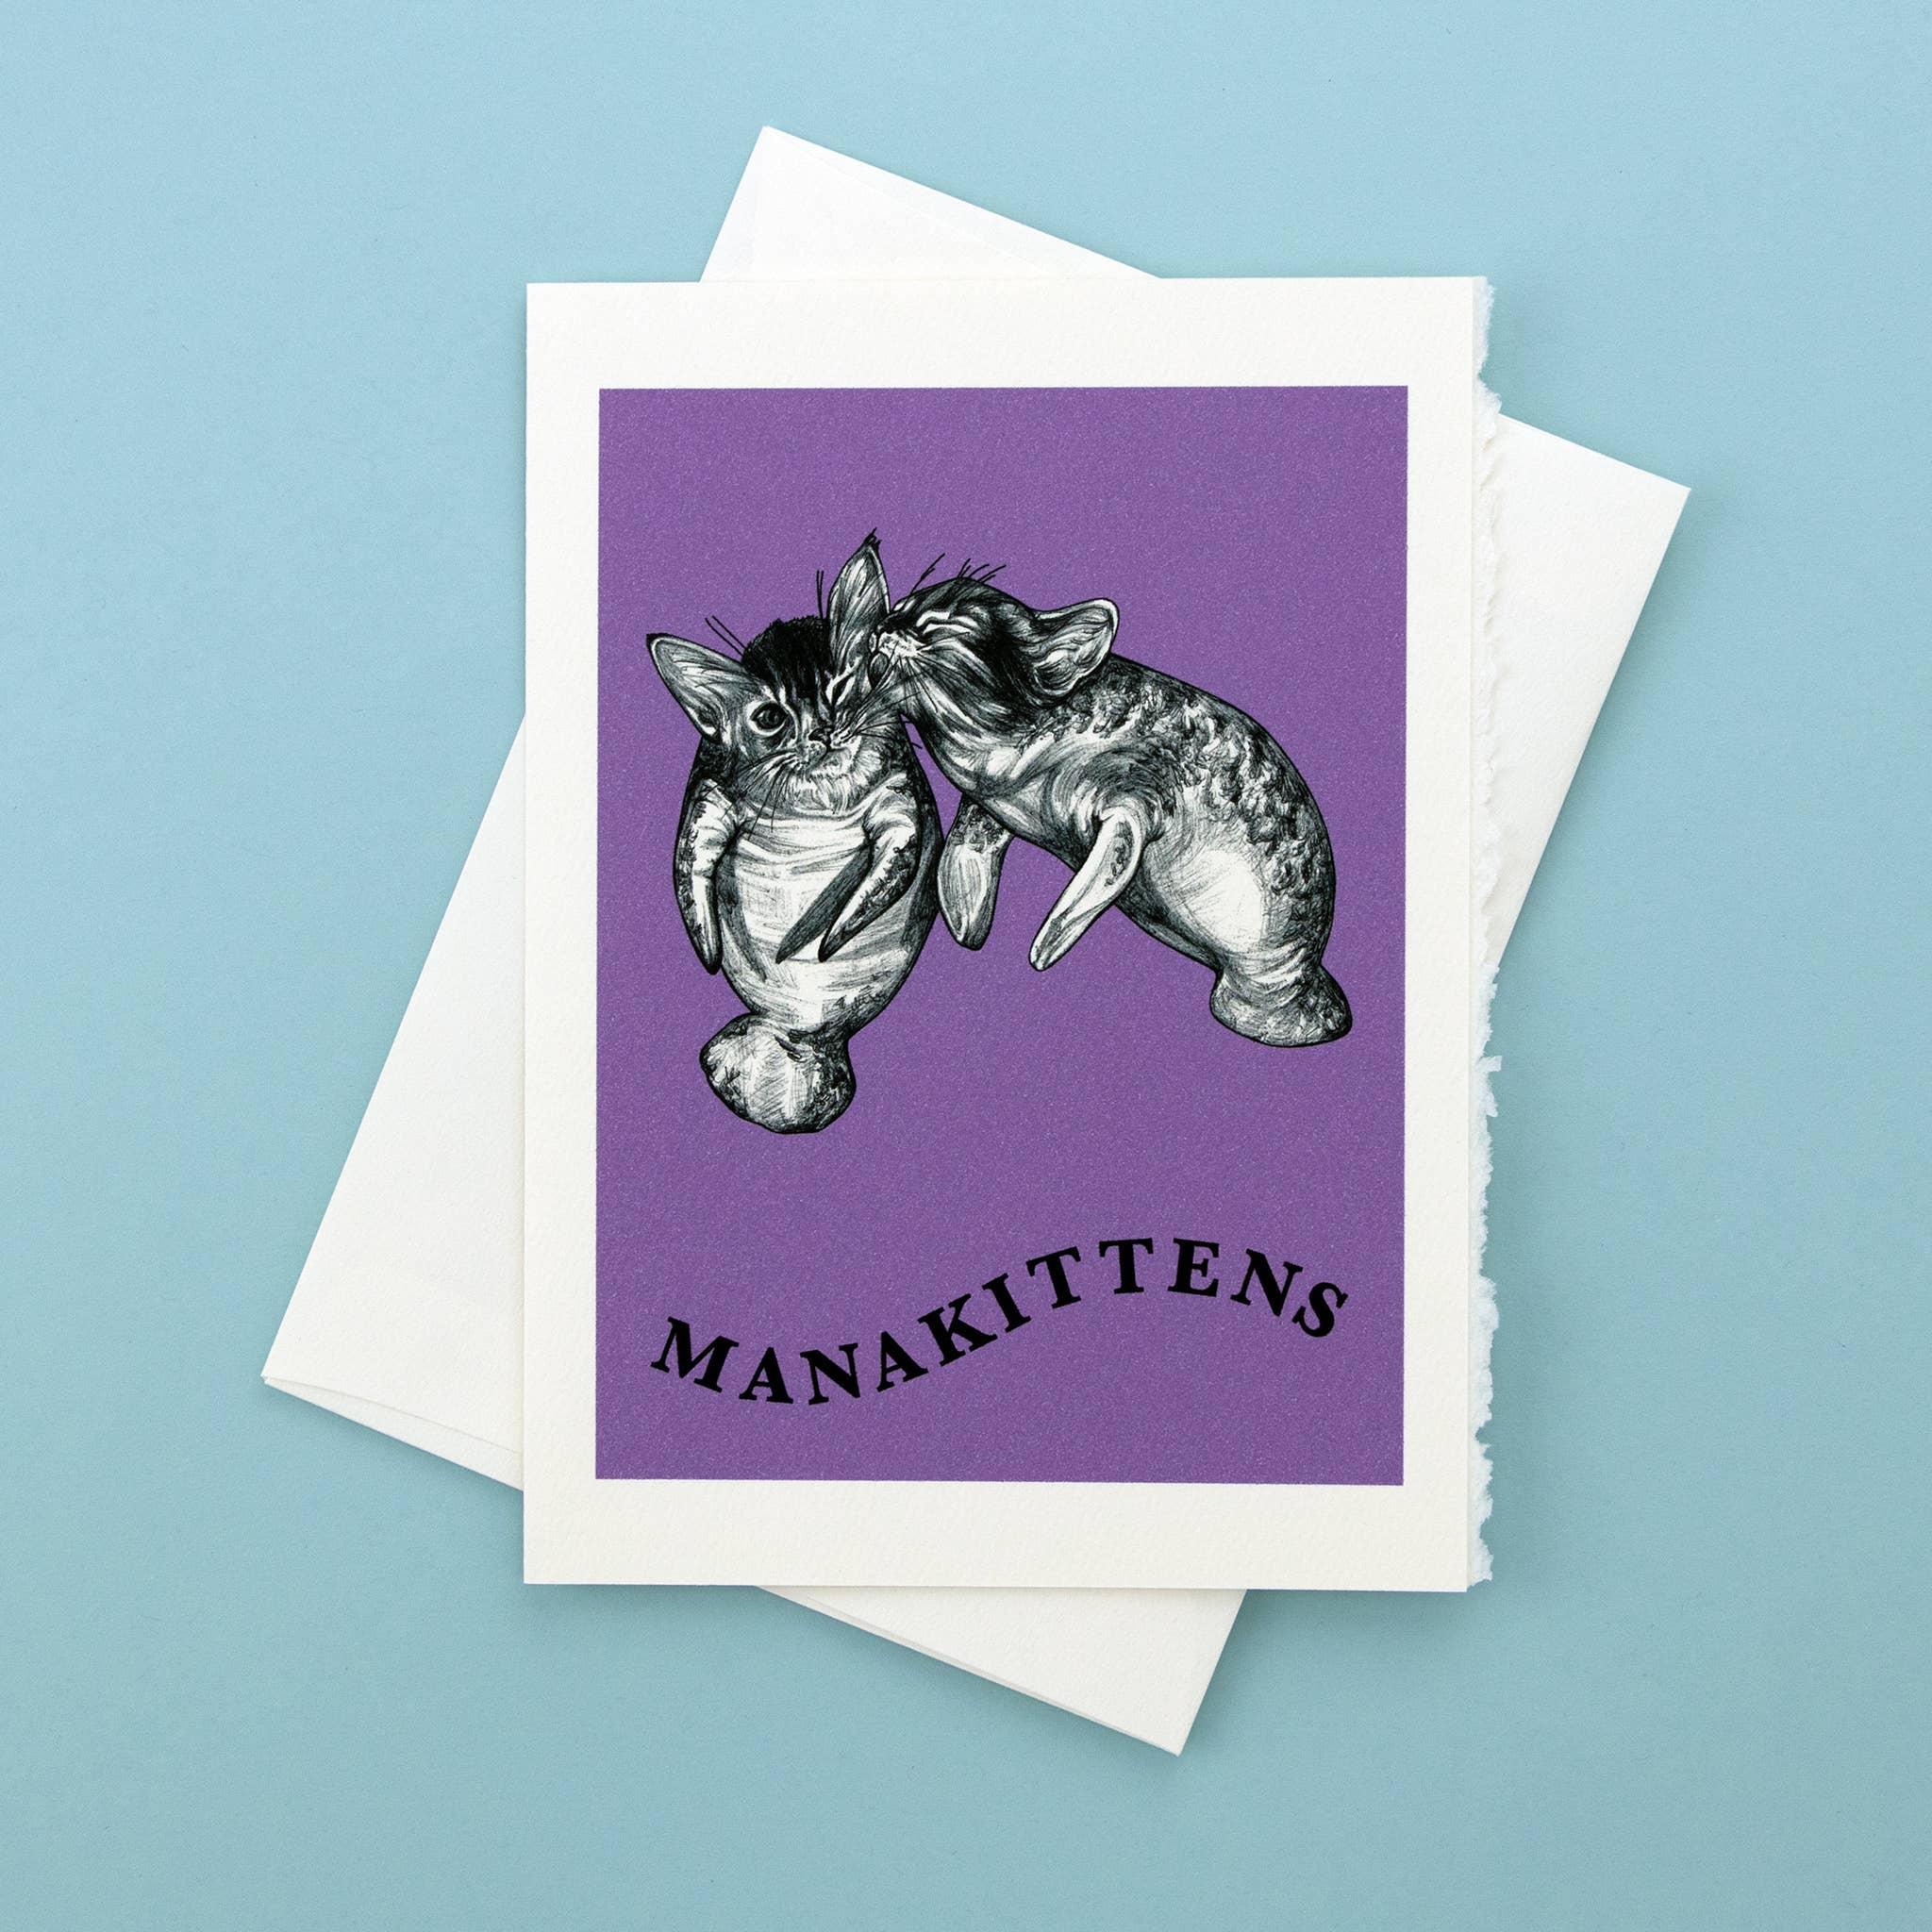 "Manakittens 5x7"" Greeting Card   Trada Marketplace"